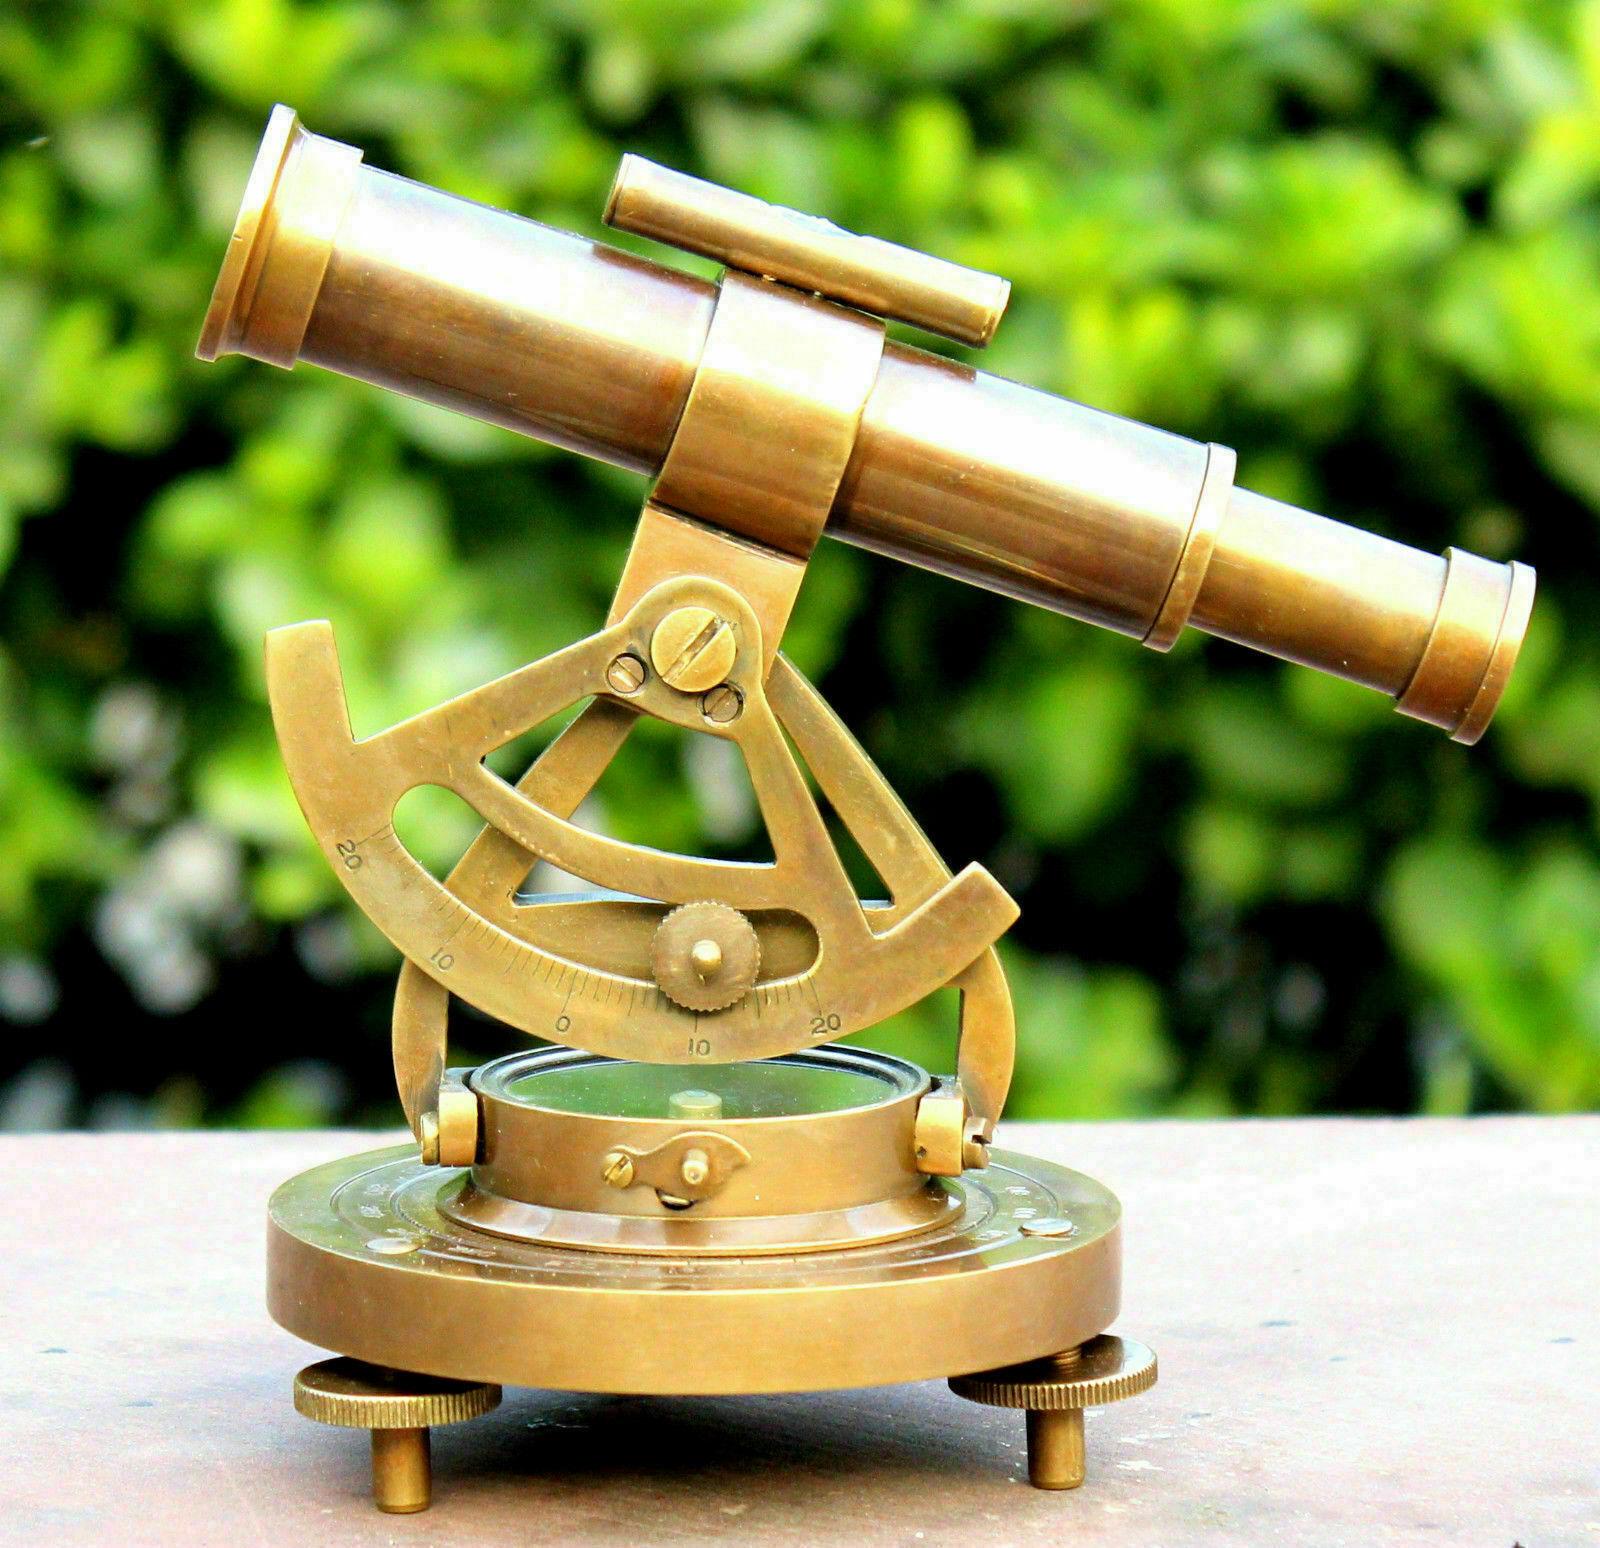 Brass Nautical Alidade Vintage Marine Telescope Maritime Compass Alidade - $33.00